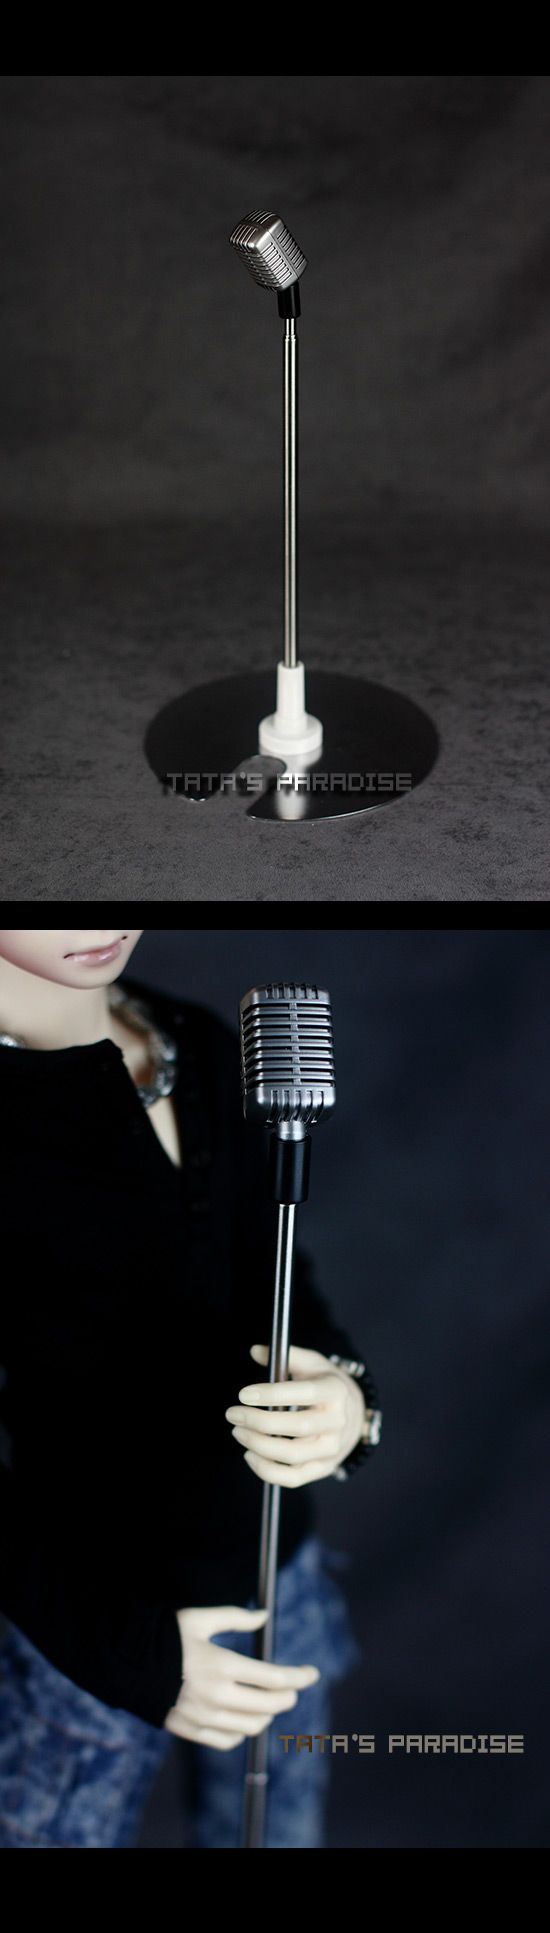 NO:LIM053 Microphone _TA·ACCESSORIES_TATA'S PARADISE